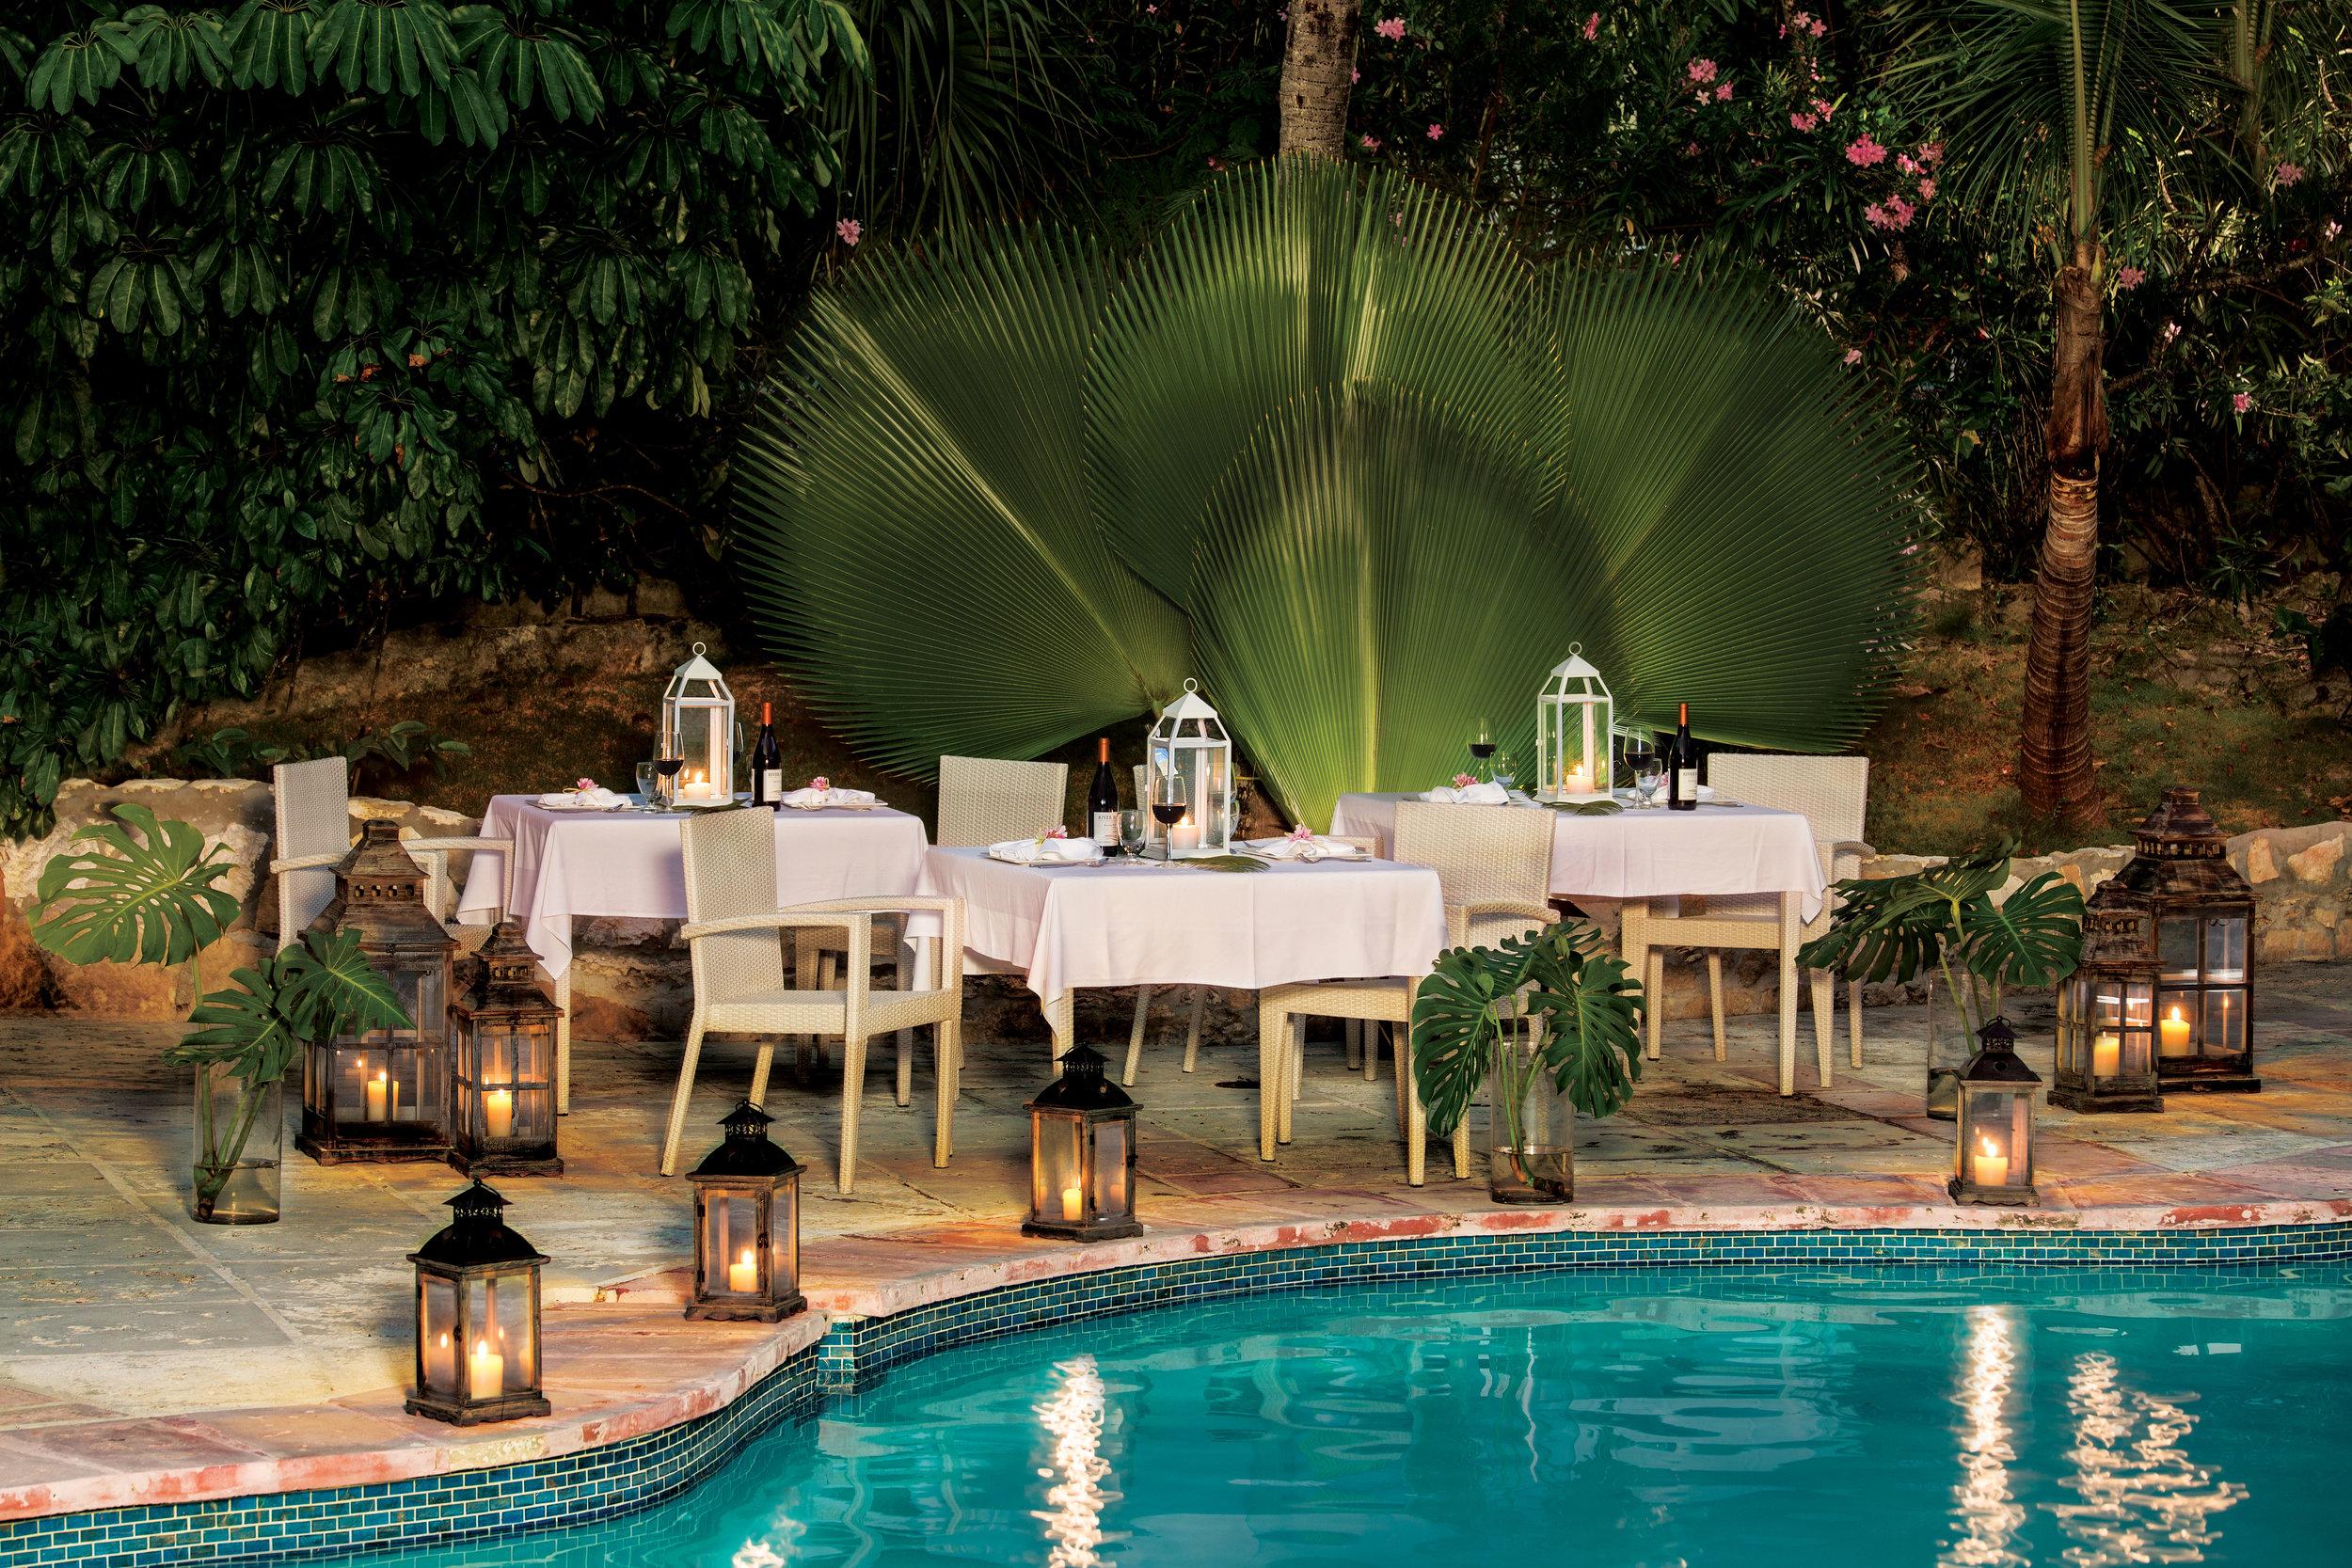 Pool_Dinner.jpg